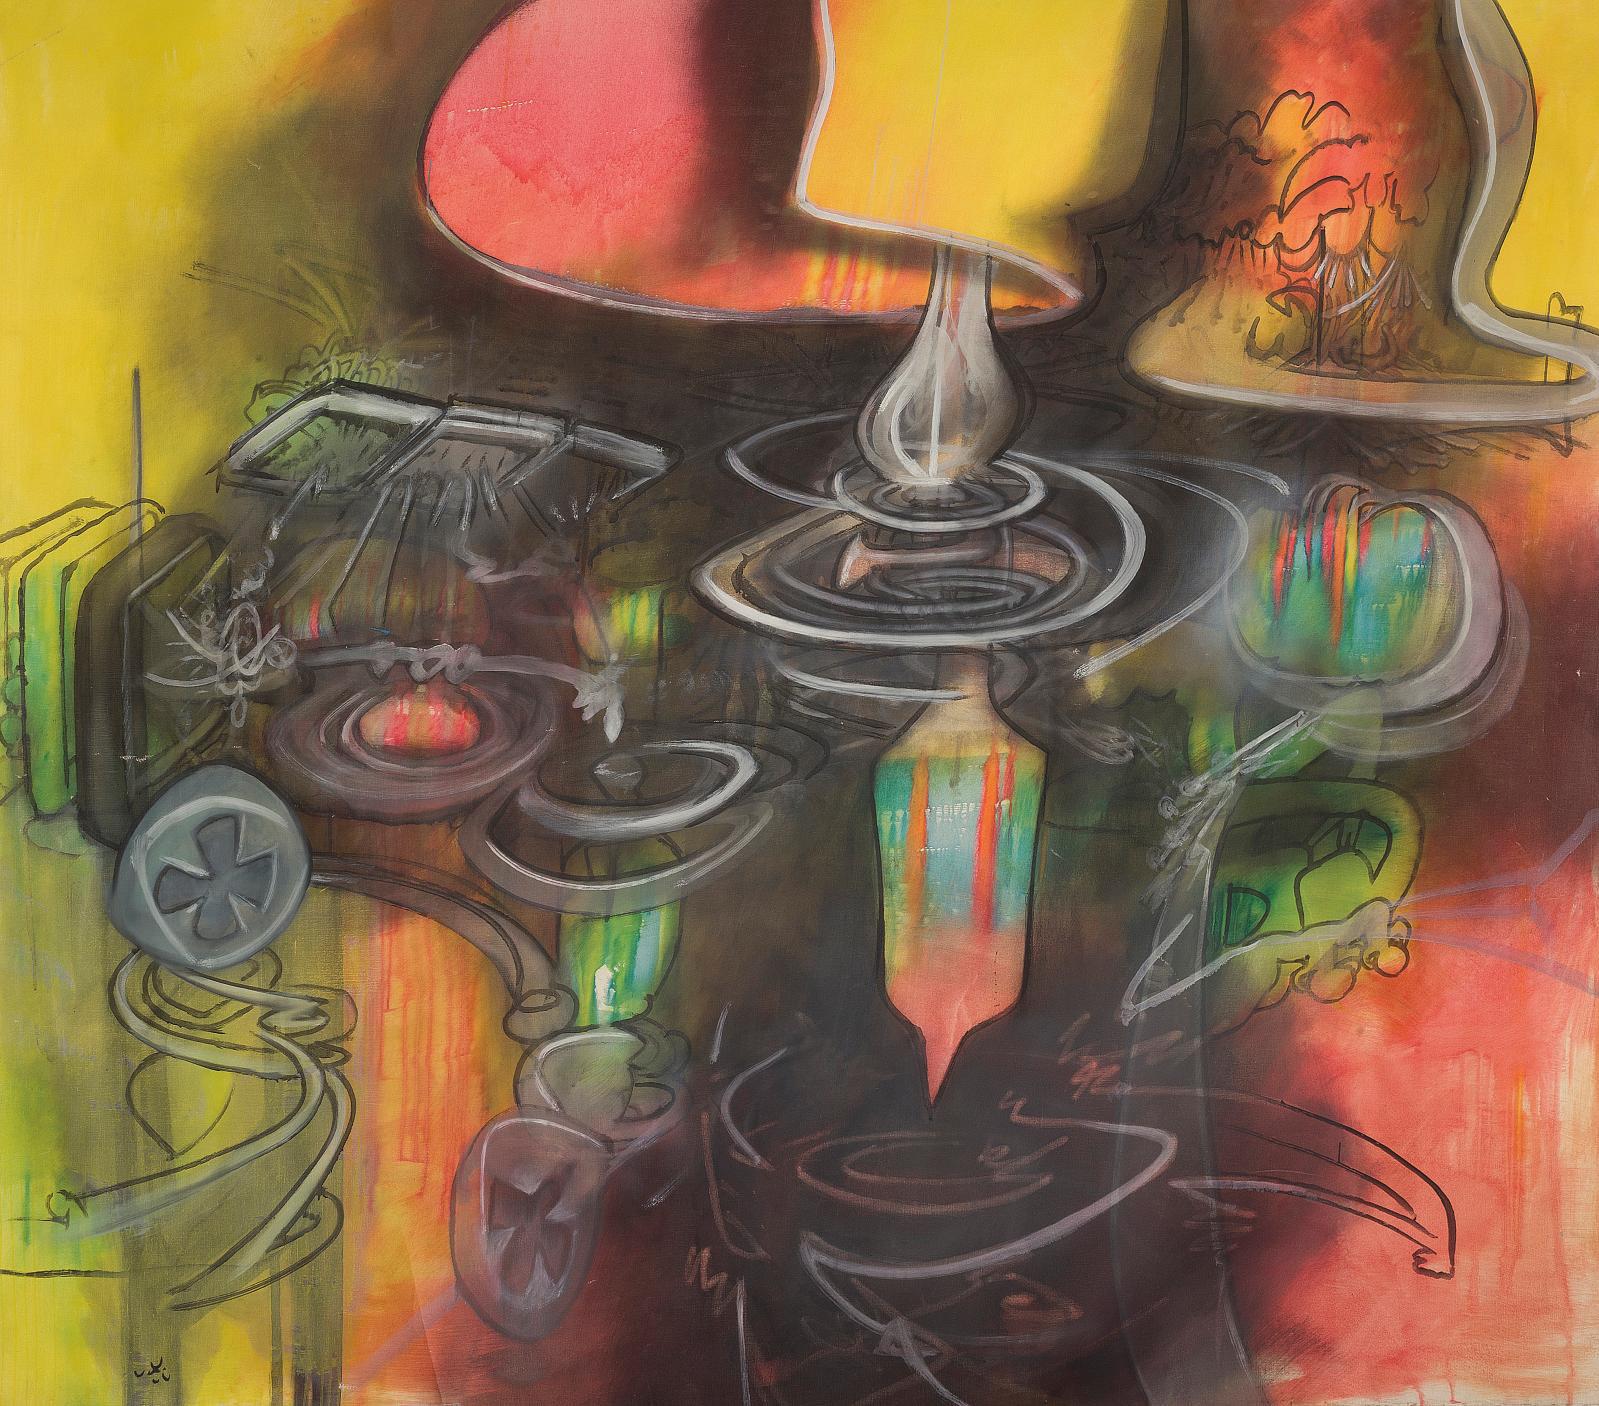 Roberto Matta (1911-2002), Infraréalisme, oil on canvas, 200 x 243 cm.Estimate: €60,000/80,000